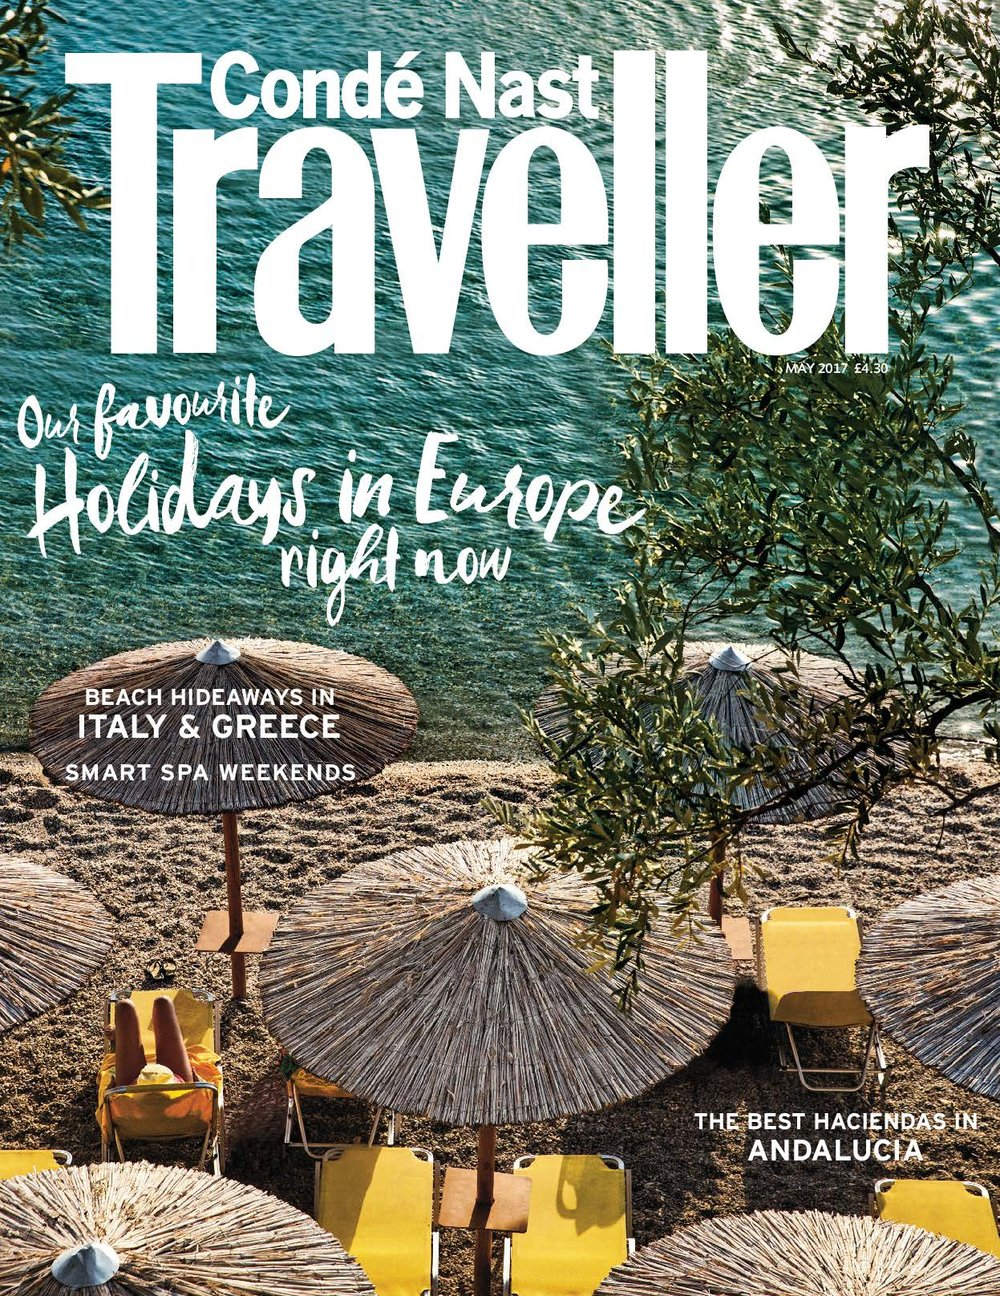 Conde Naste Traveller Cover.jpg